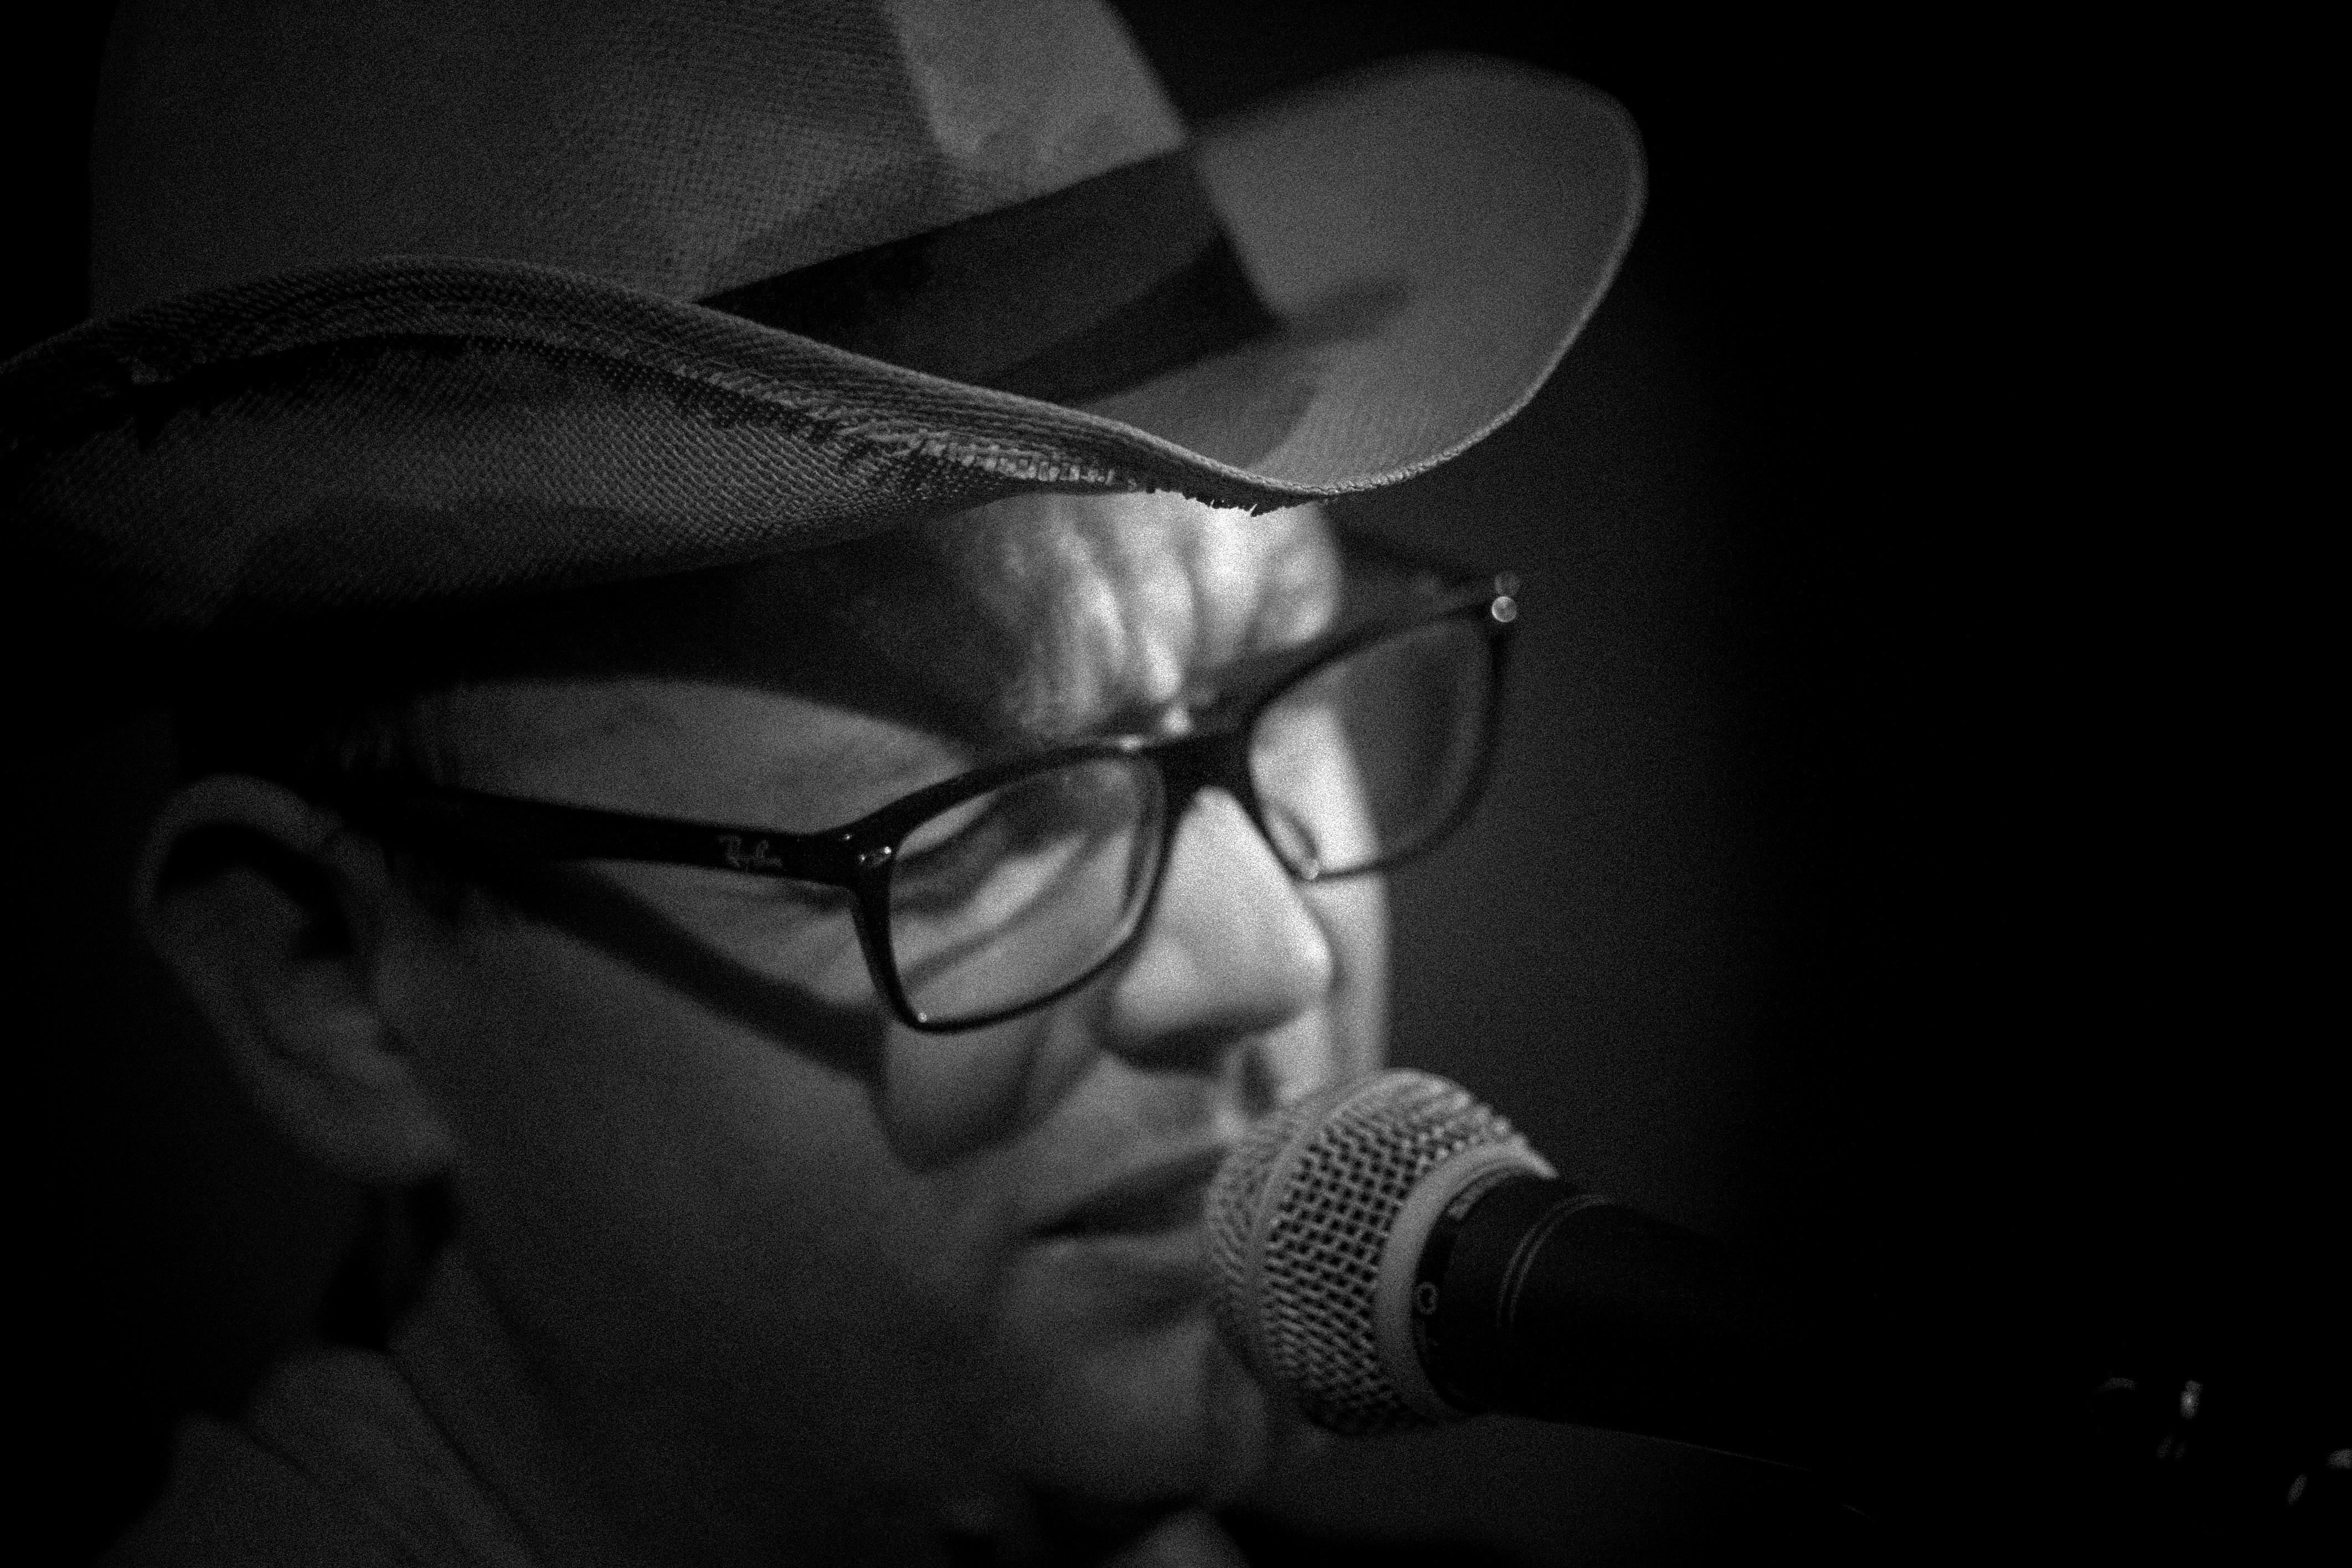 Luciano Macchia crooner